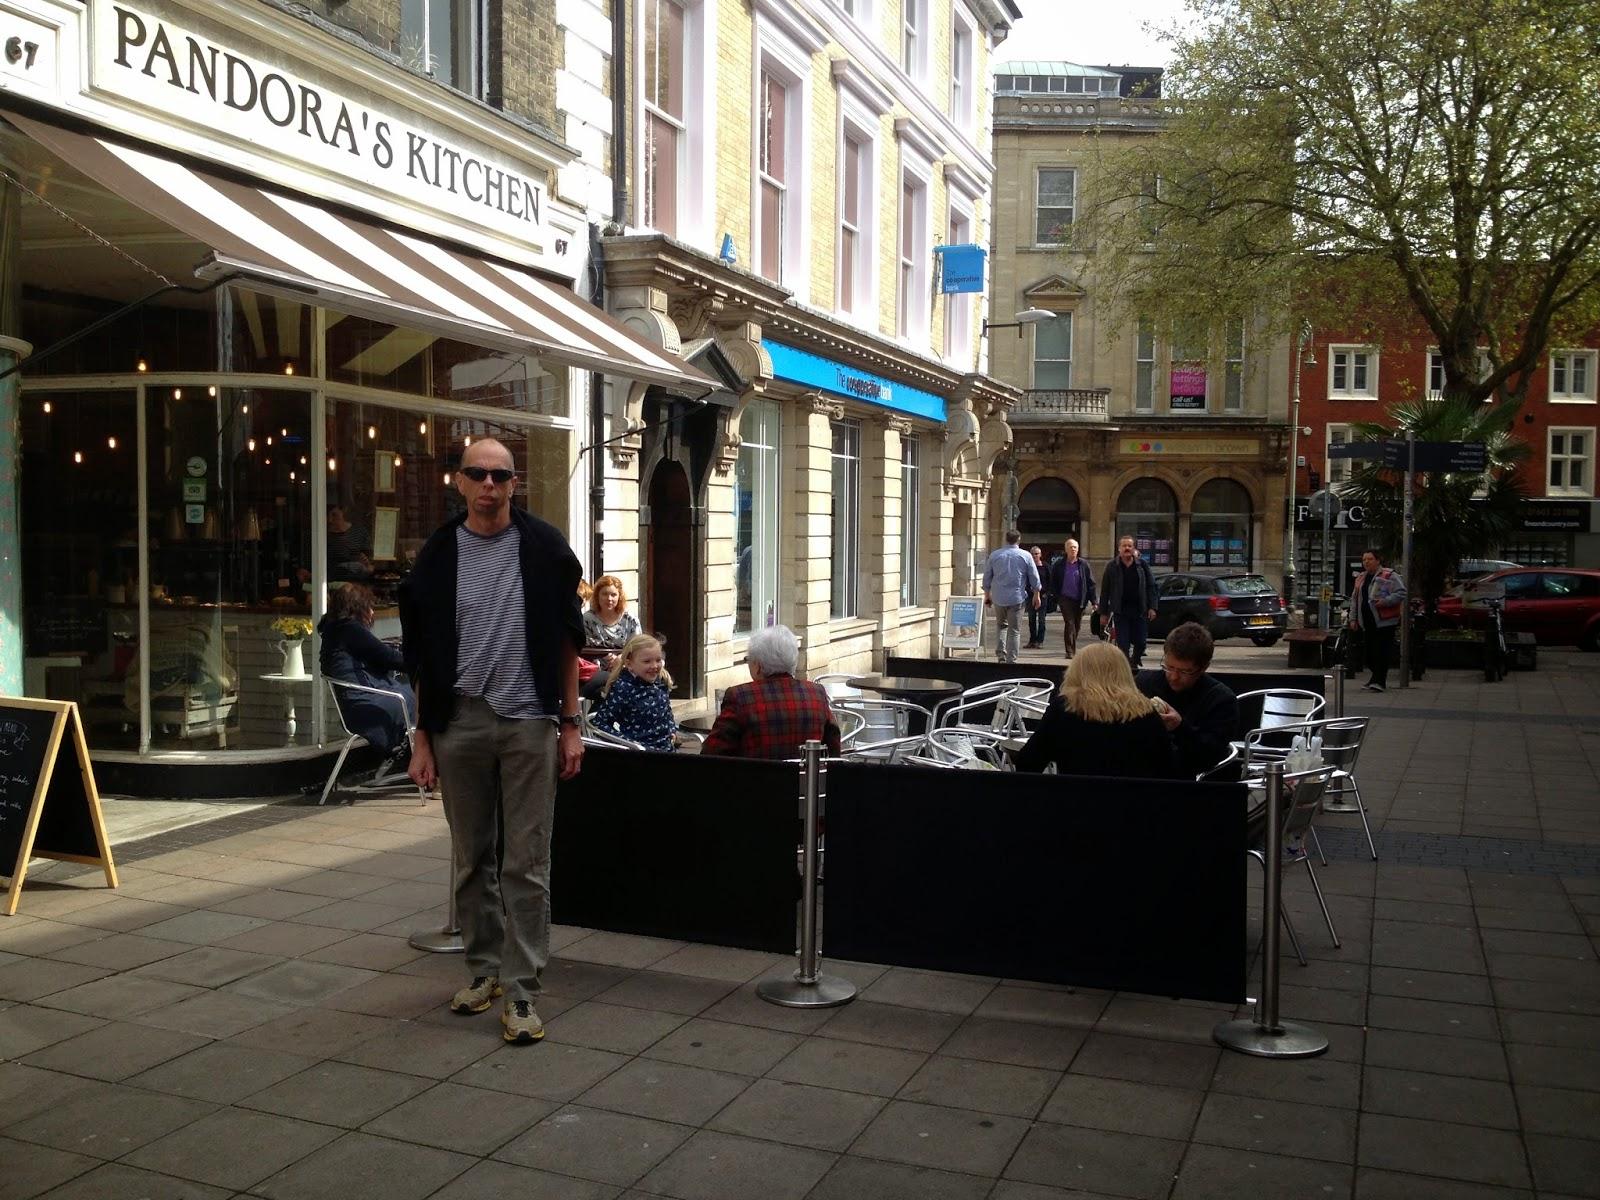 Pandora In Norwich